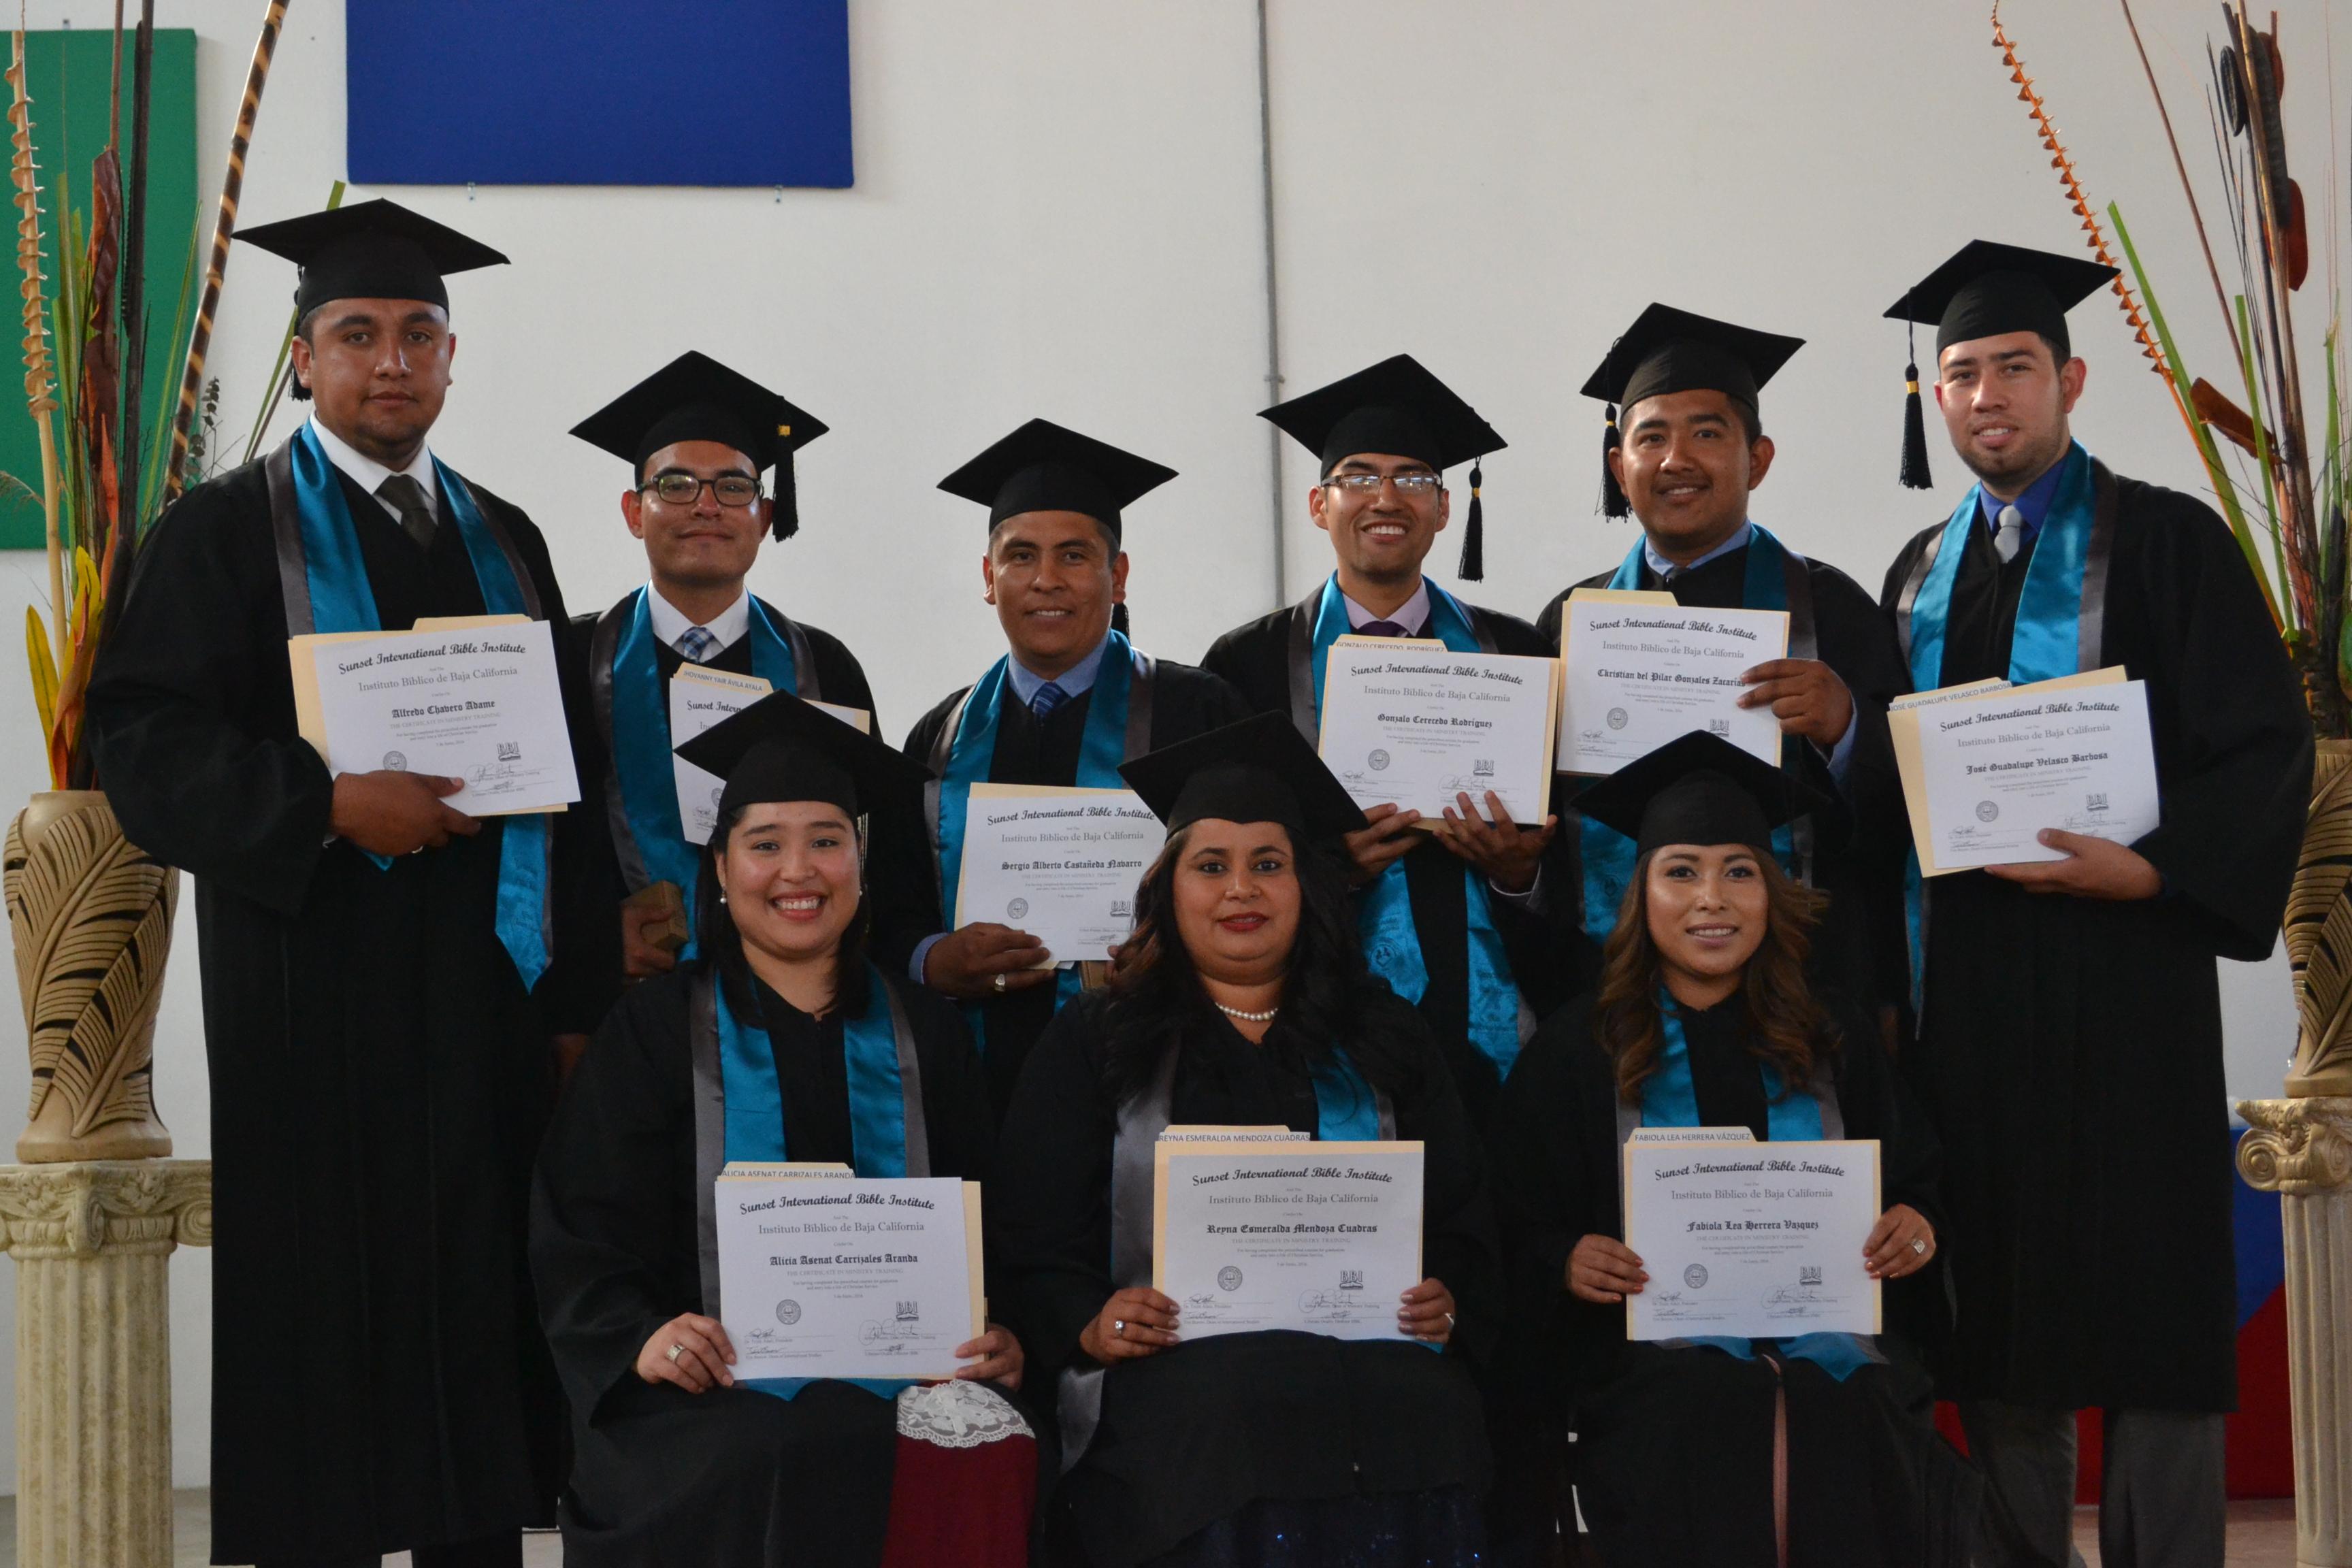 BBI Class of 2016